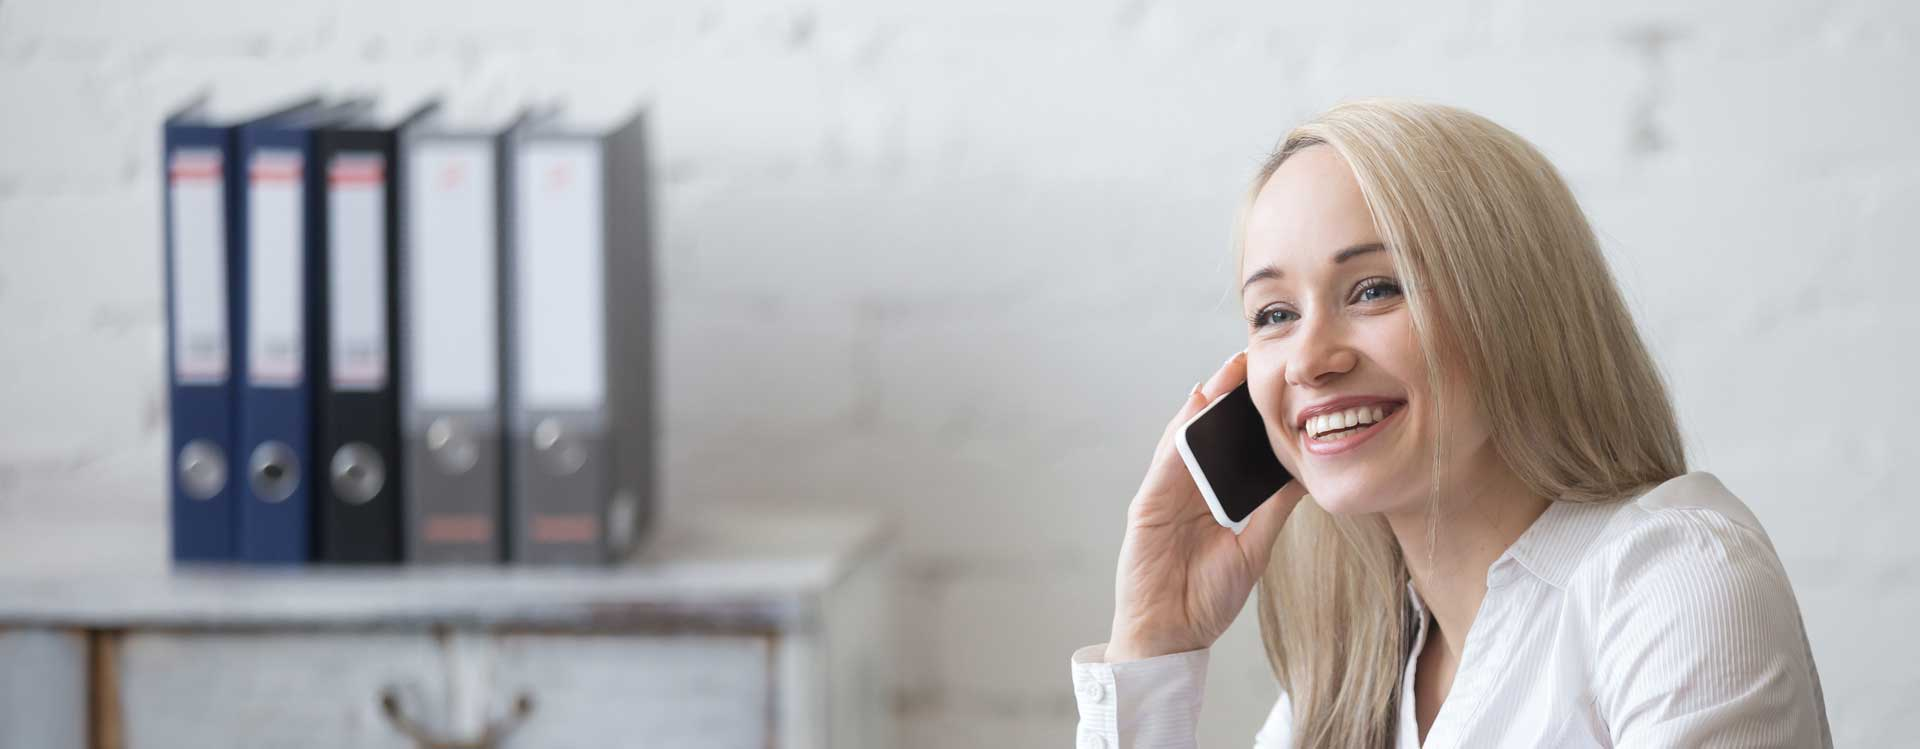 in raise happy businesswoman working her office